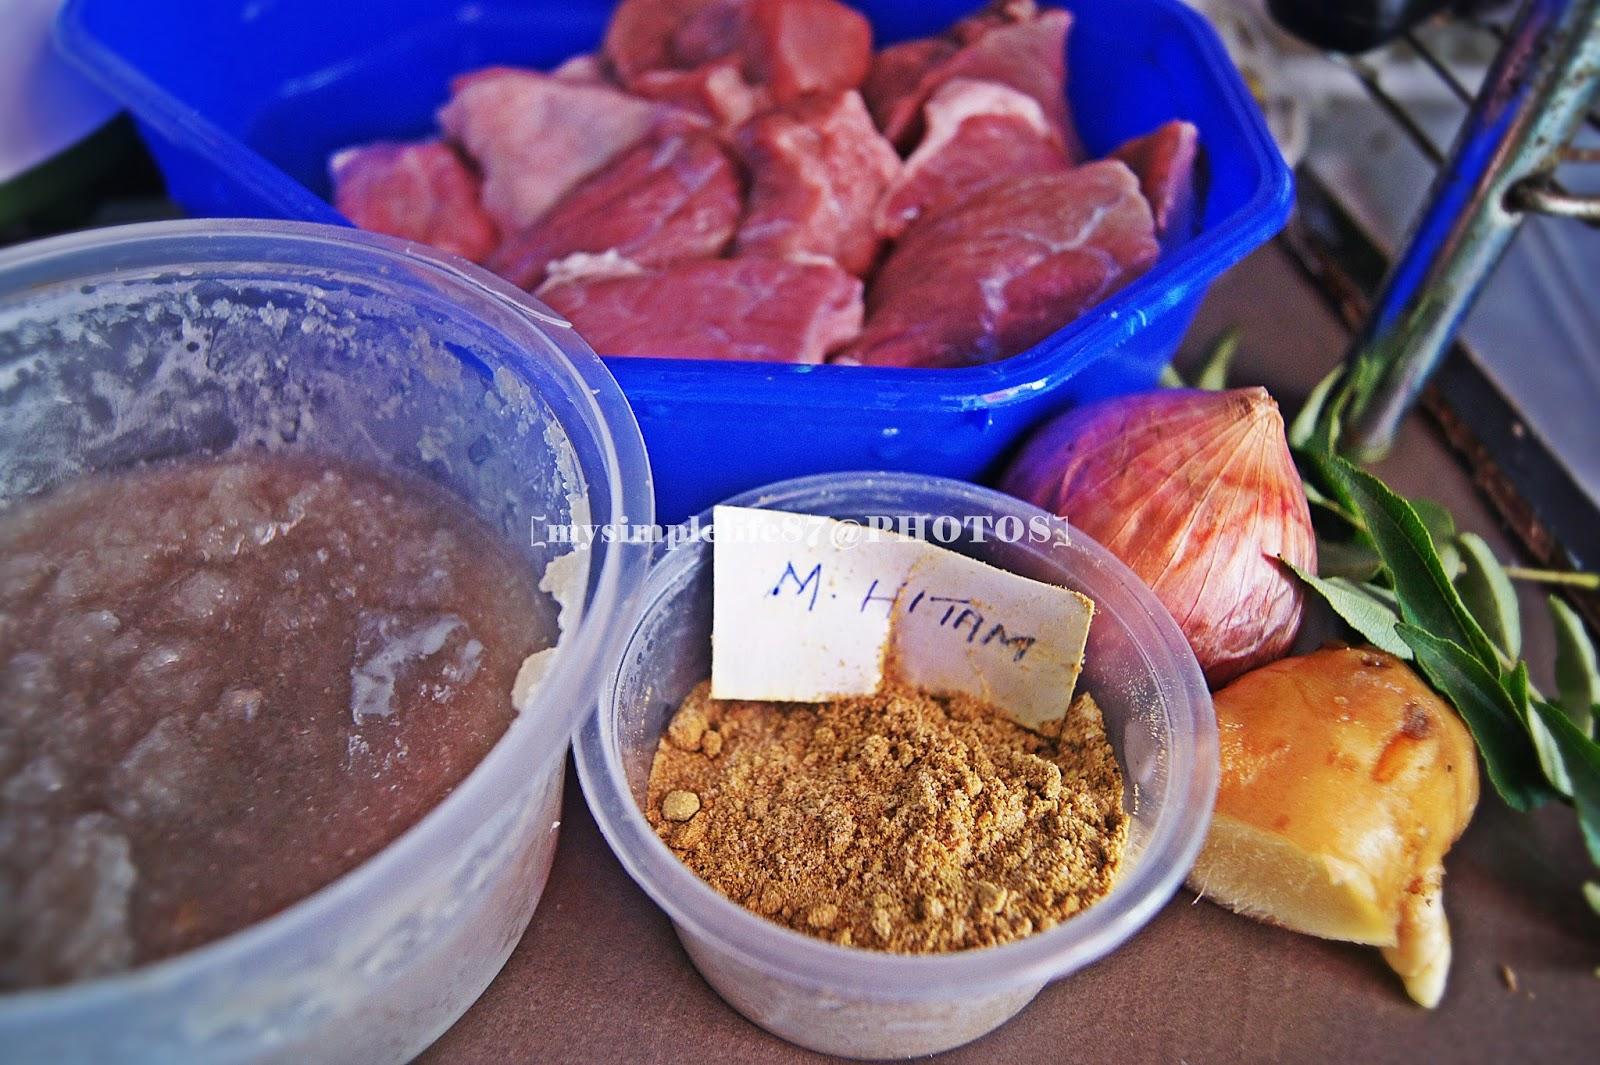 Daging Masak Hitam Mamak Lauk Daging Masak Hitam